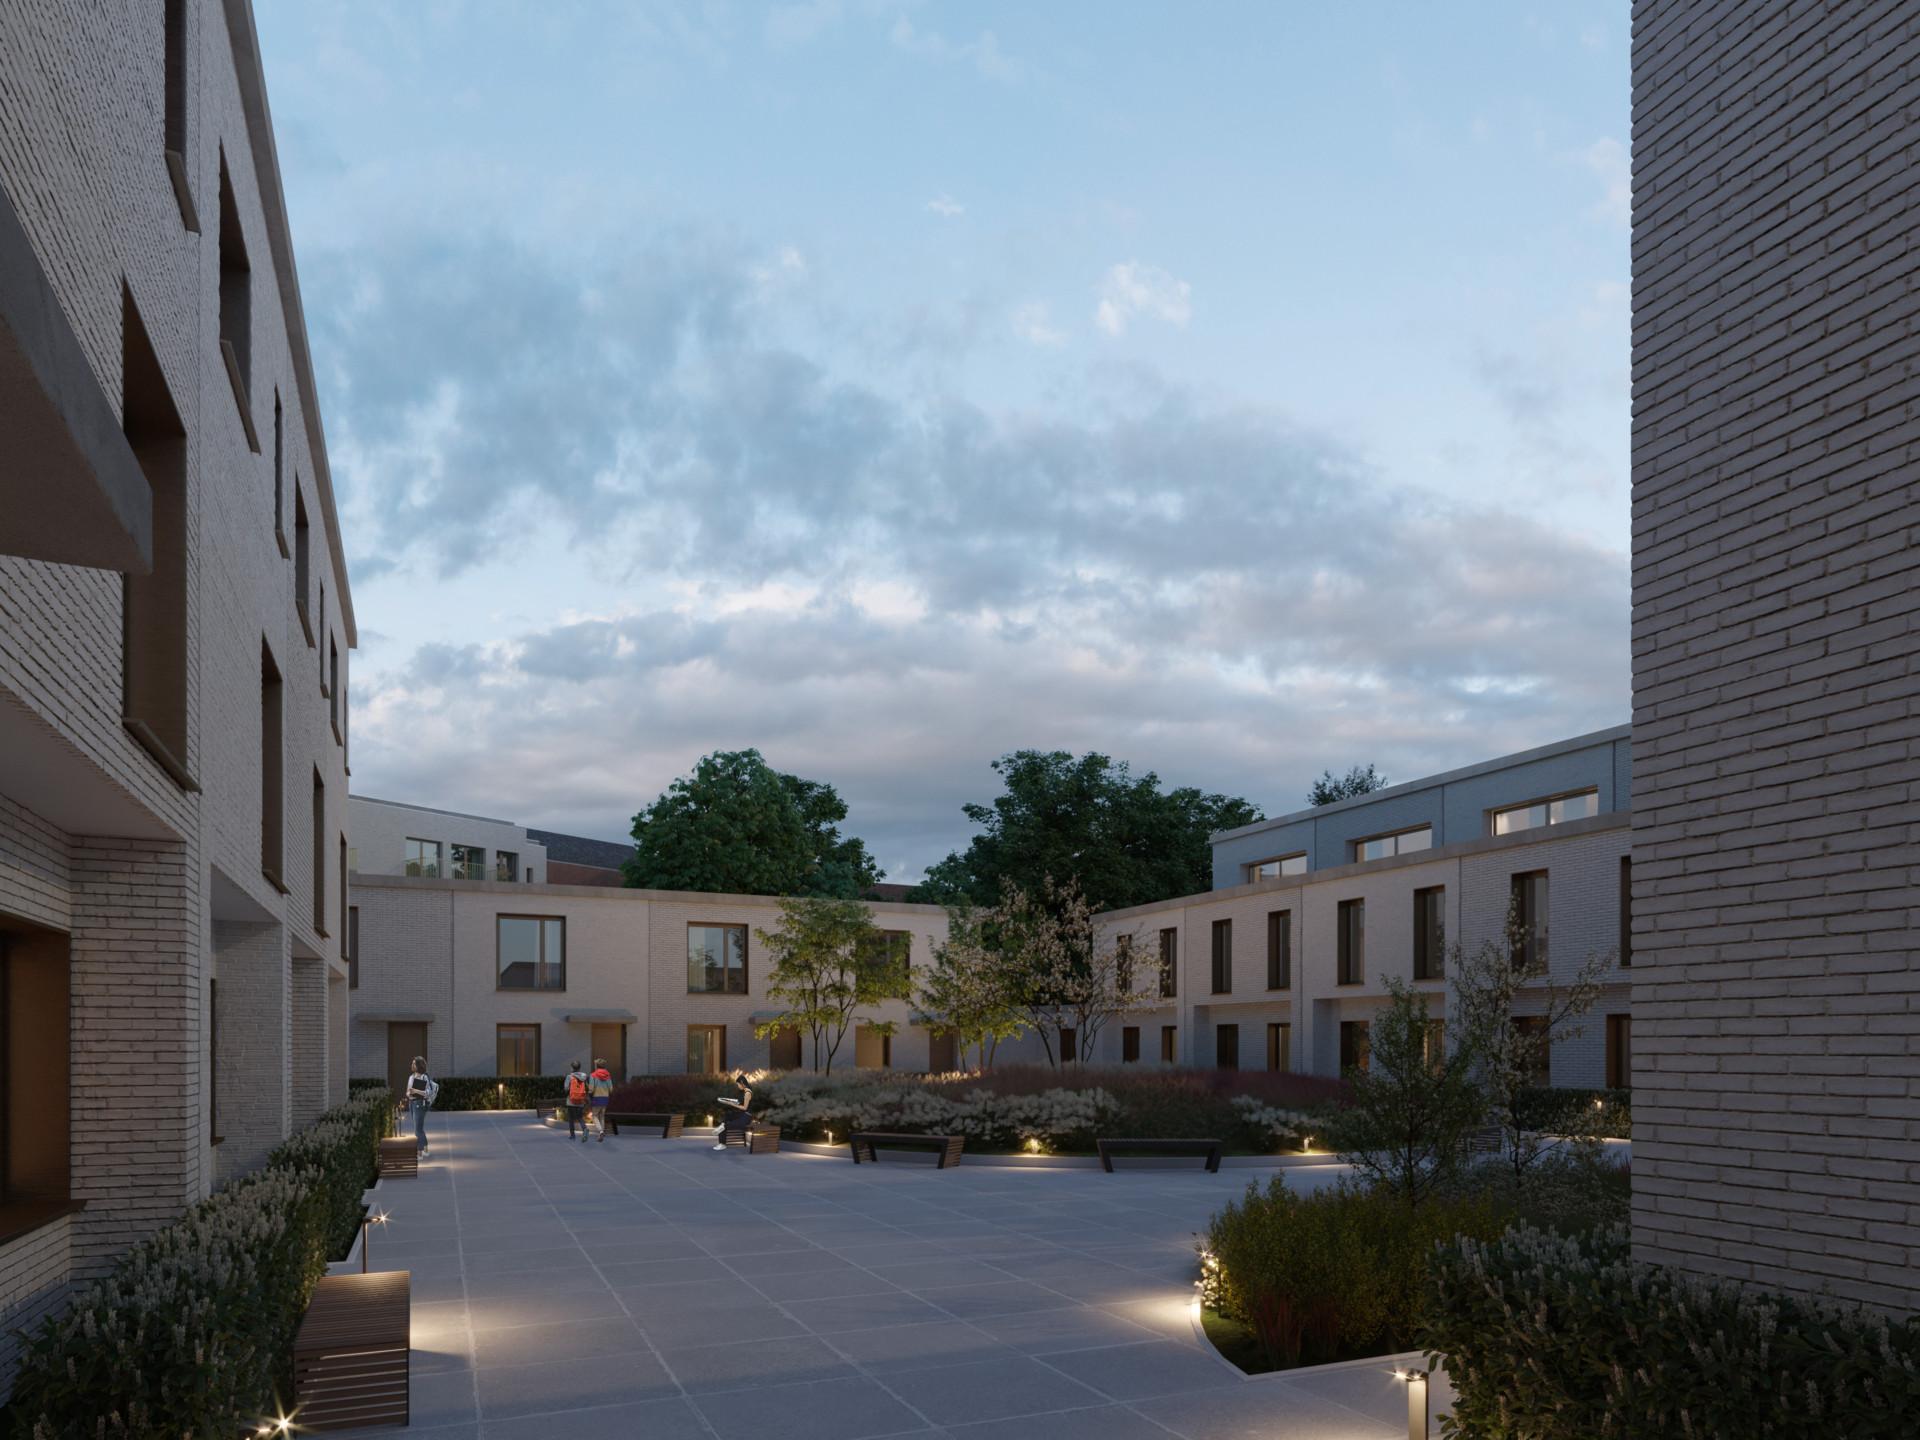 Hill-Yard-hoog-duurzaam-wooncomfort